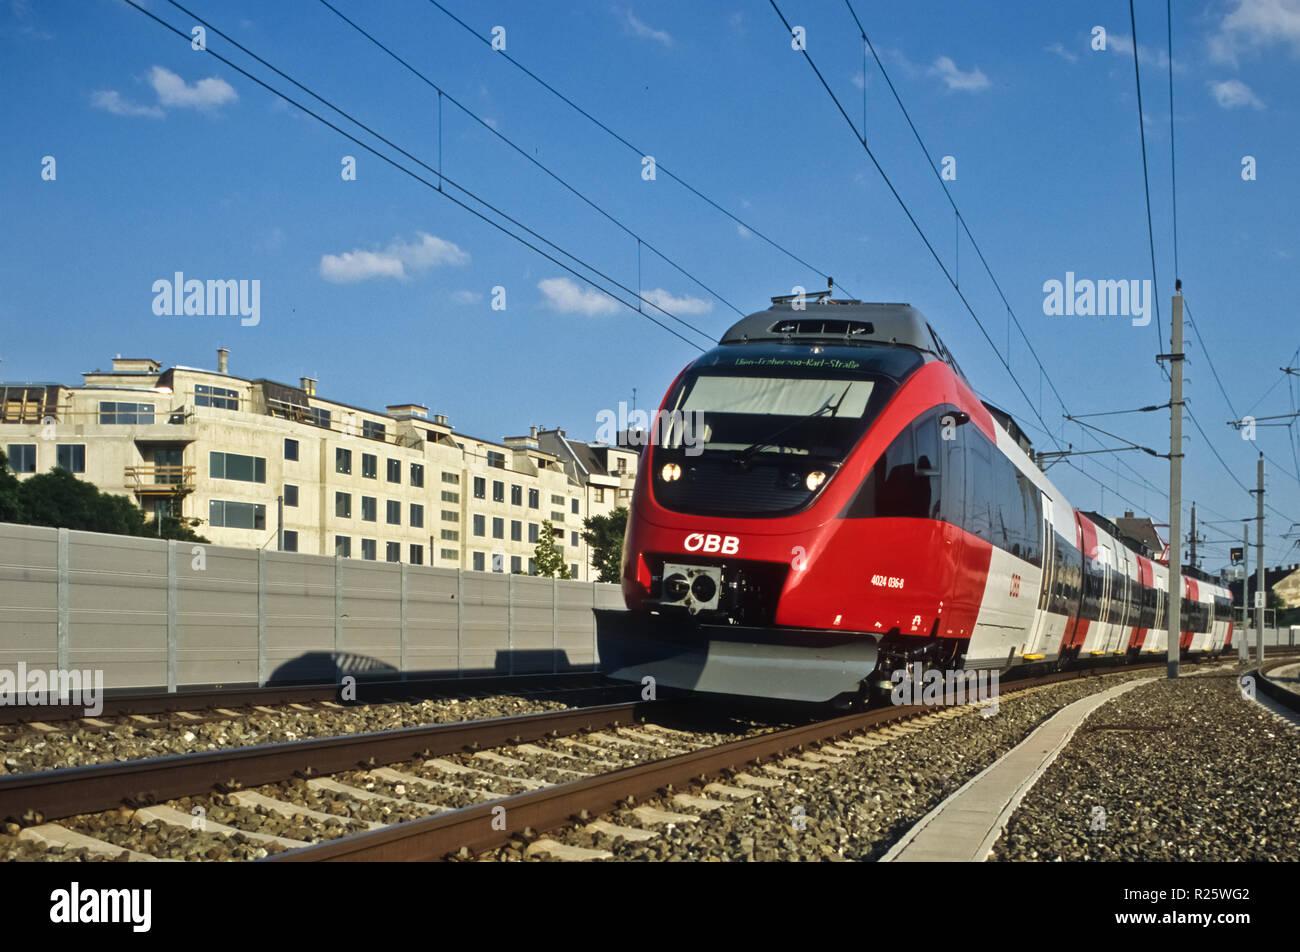 moderner Nahverkehrszug - Modern Commuter Train - Stock Image